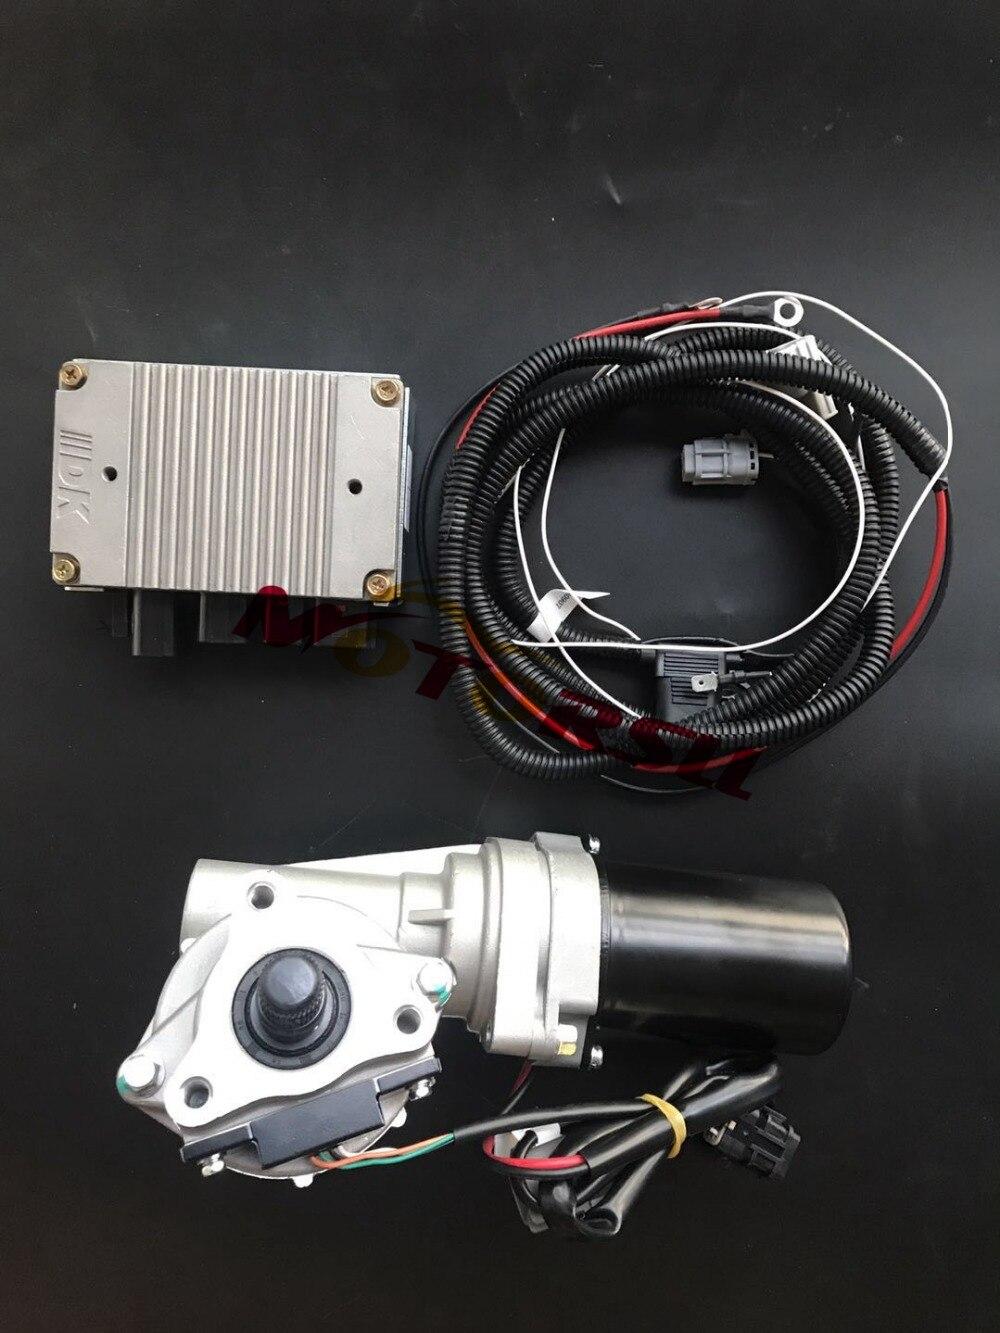 ELECTRIC POWER STEERING EPS CONTROLLER FOR UTV Universal CF800 u8 CF moto zforce550 u550 9060 104060 HISUN700 jianshe linhai